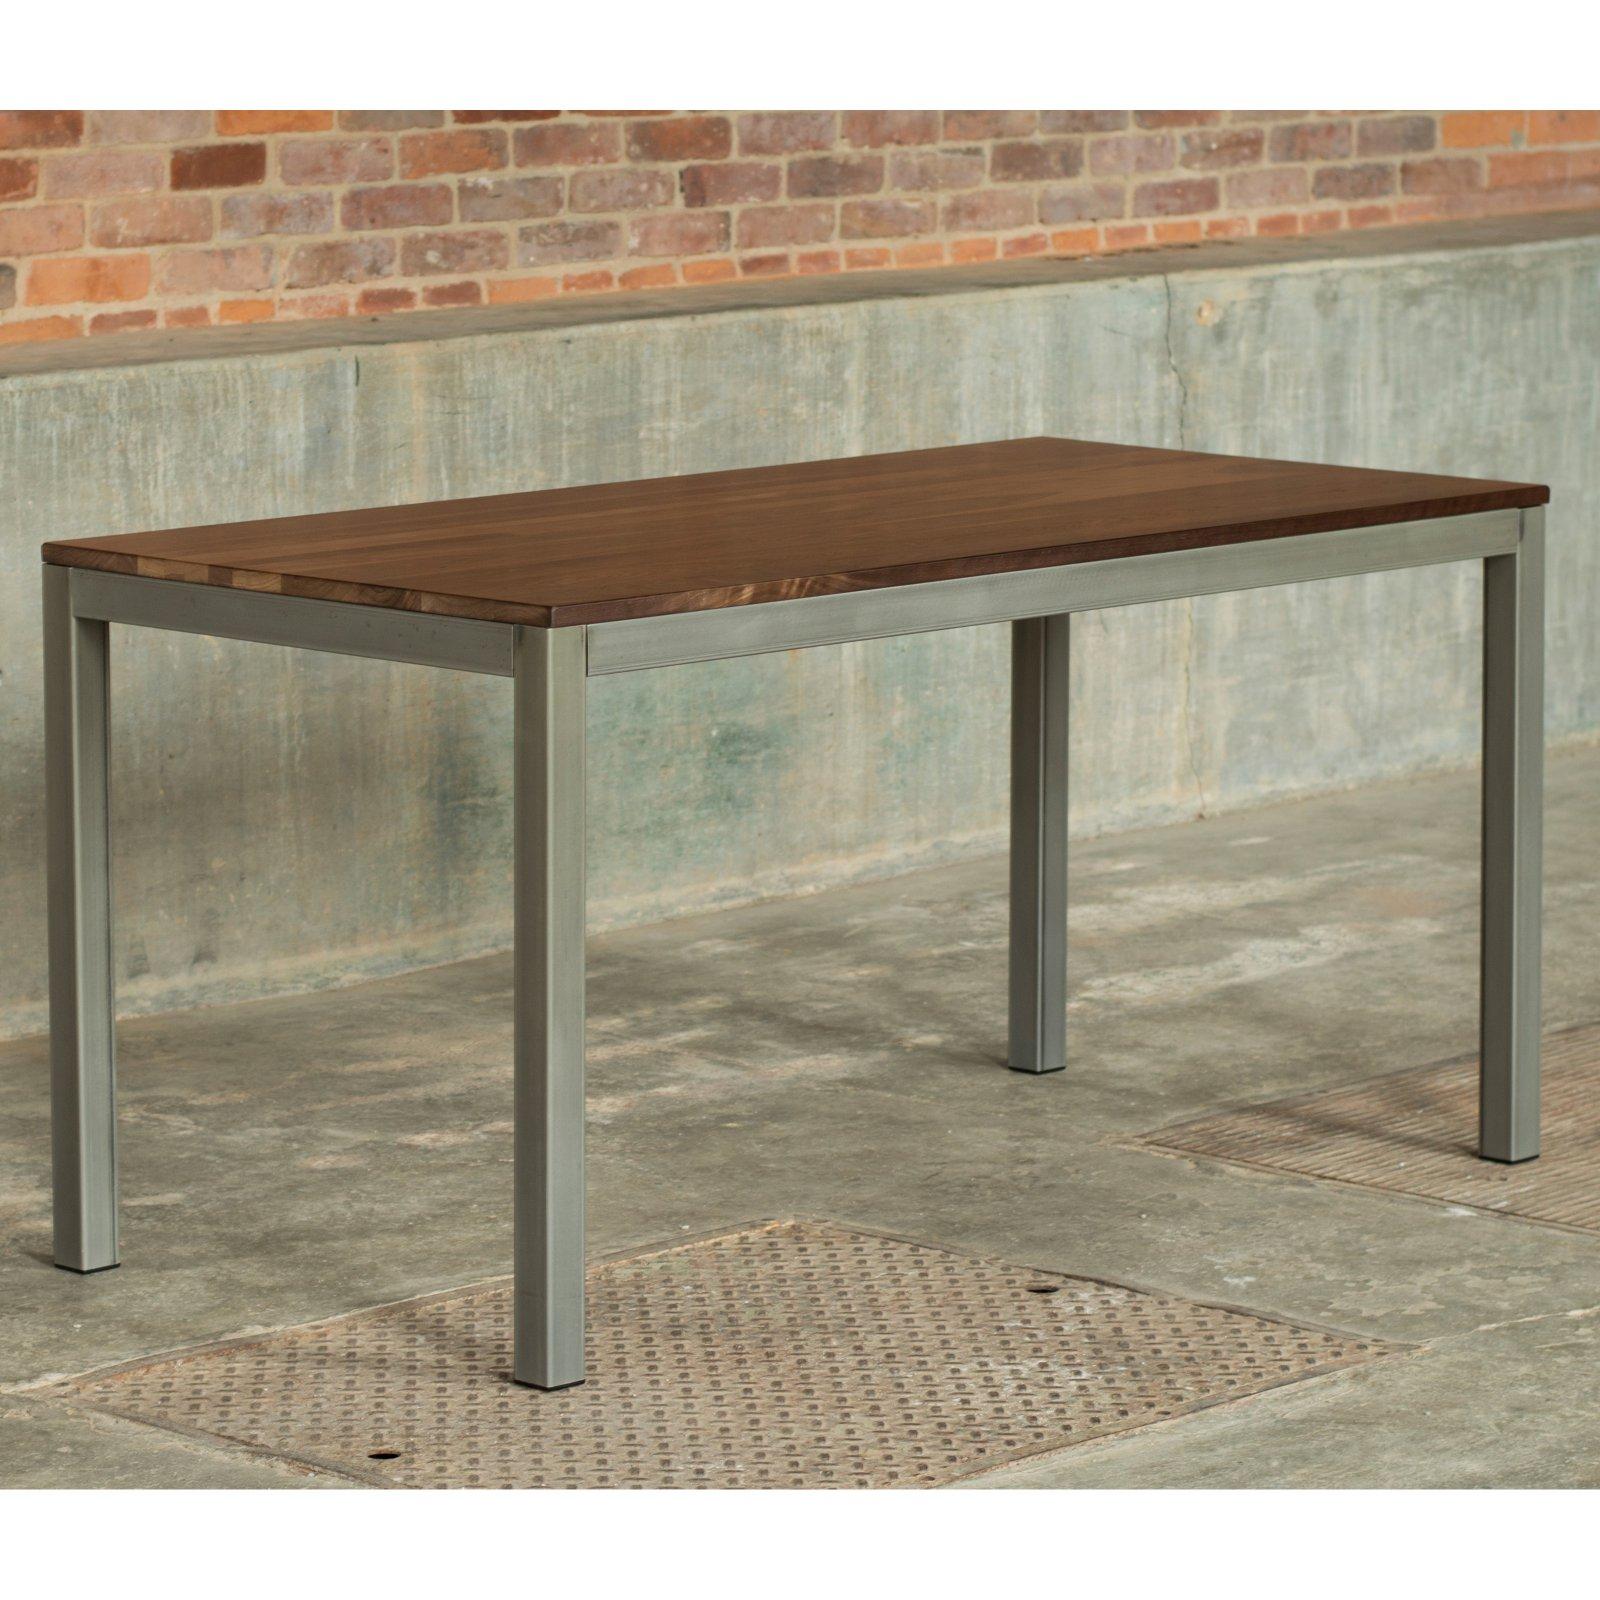 Elan Furniture Loft Dining Table - Walnut